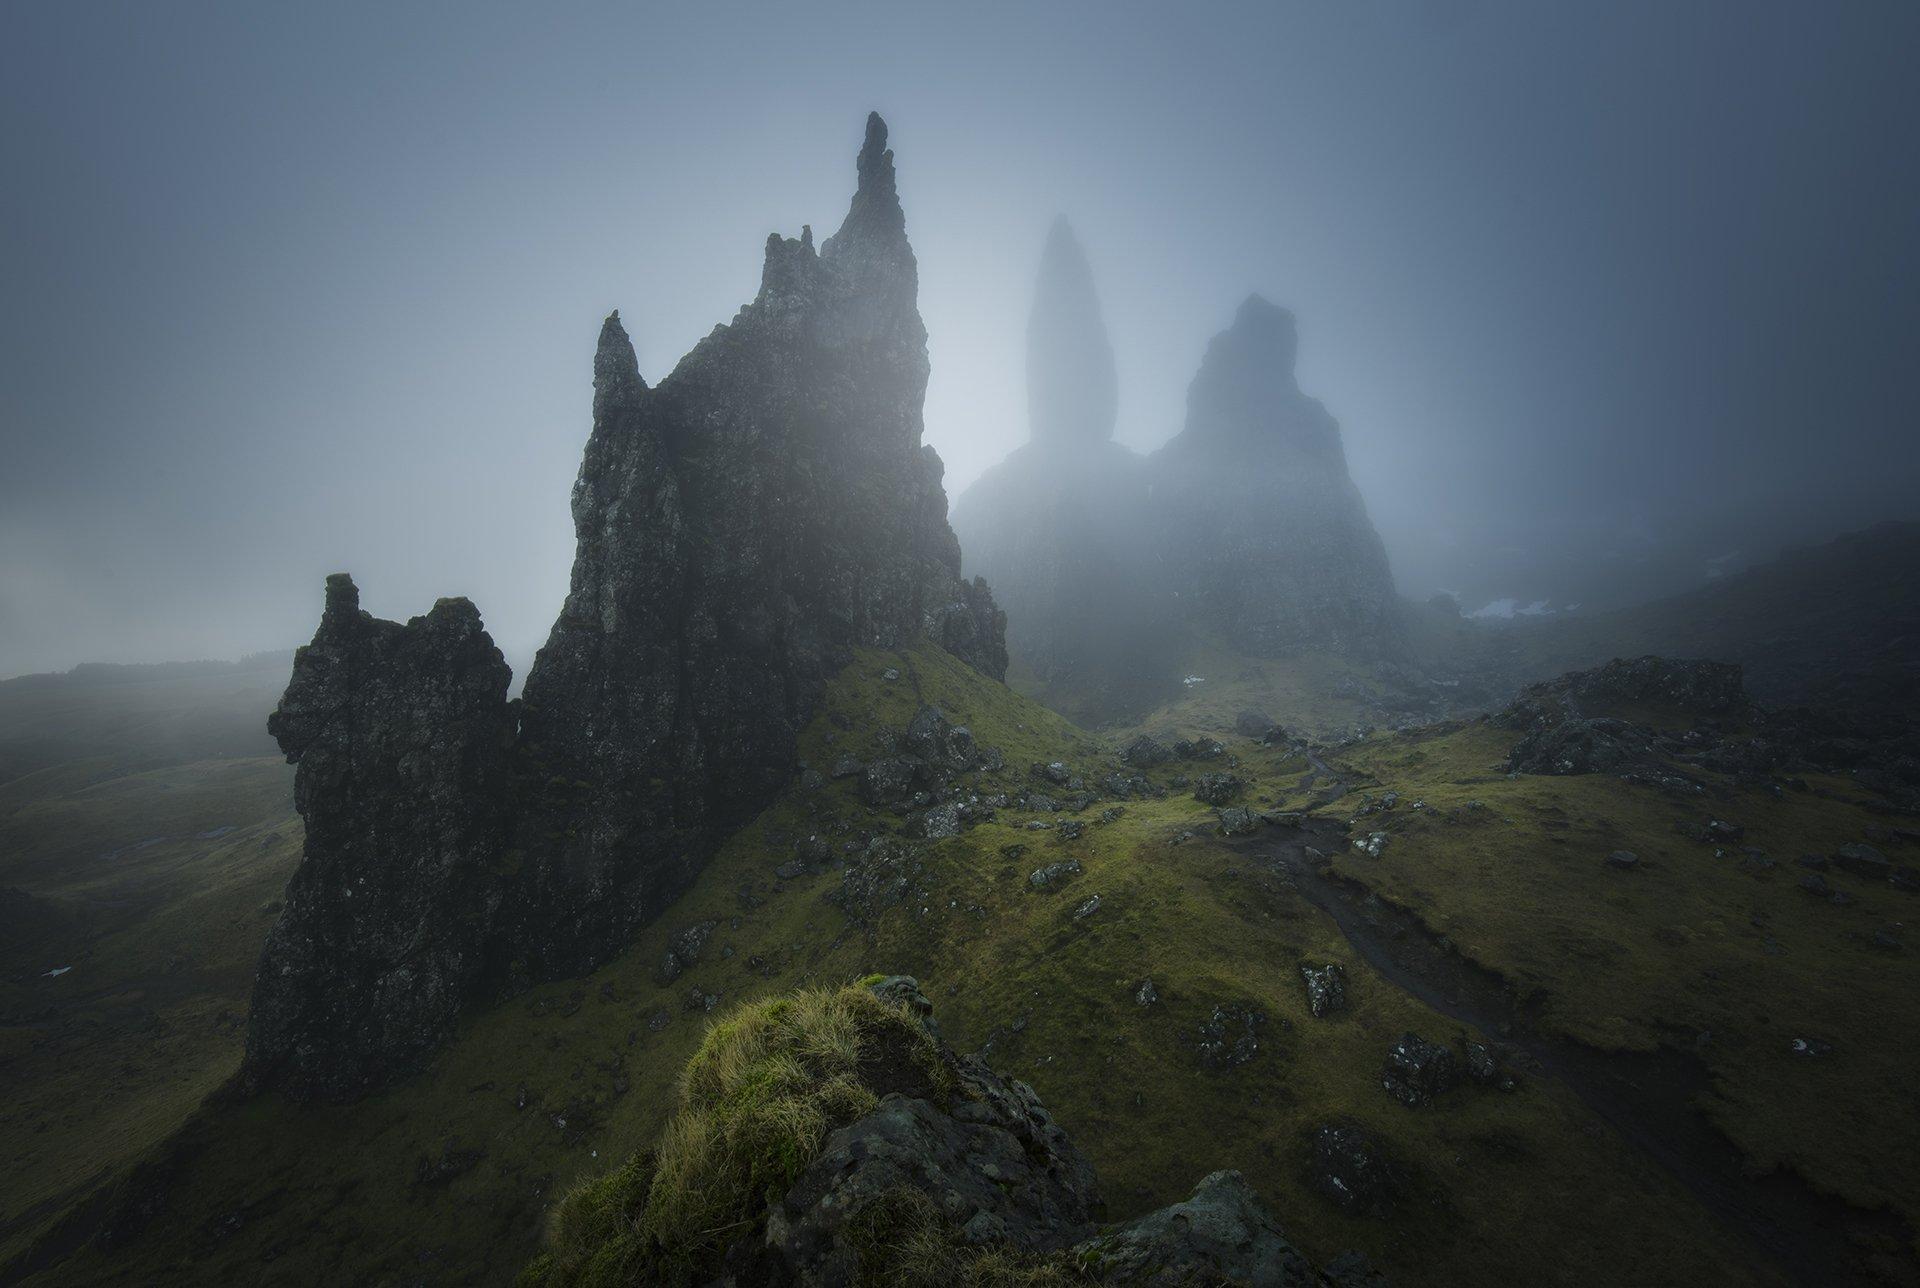 scotland, isleofskye, elgol, nature, landscape, пейзаж, clouds, dramatic, Genadi Dochev